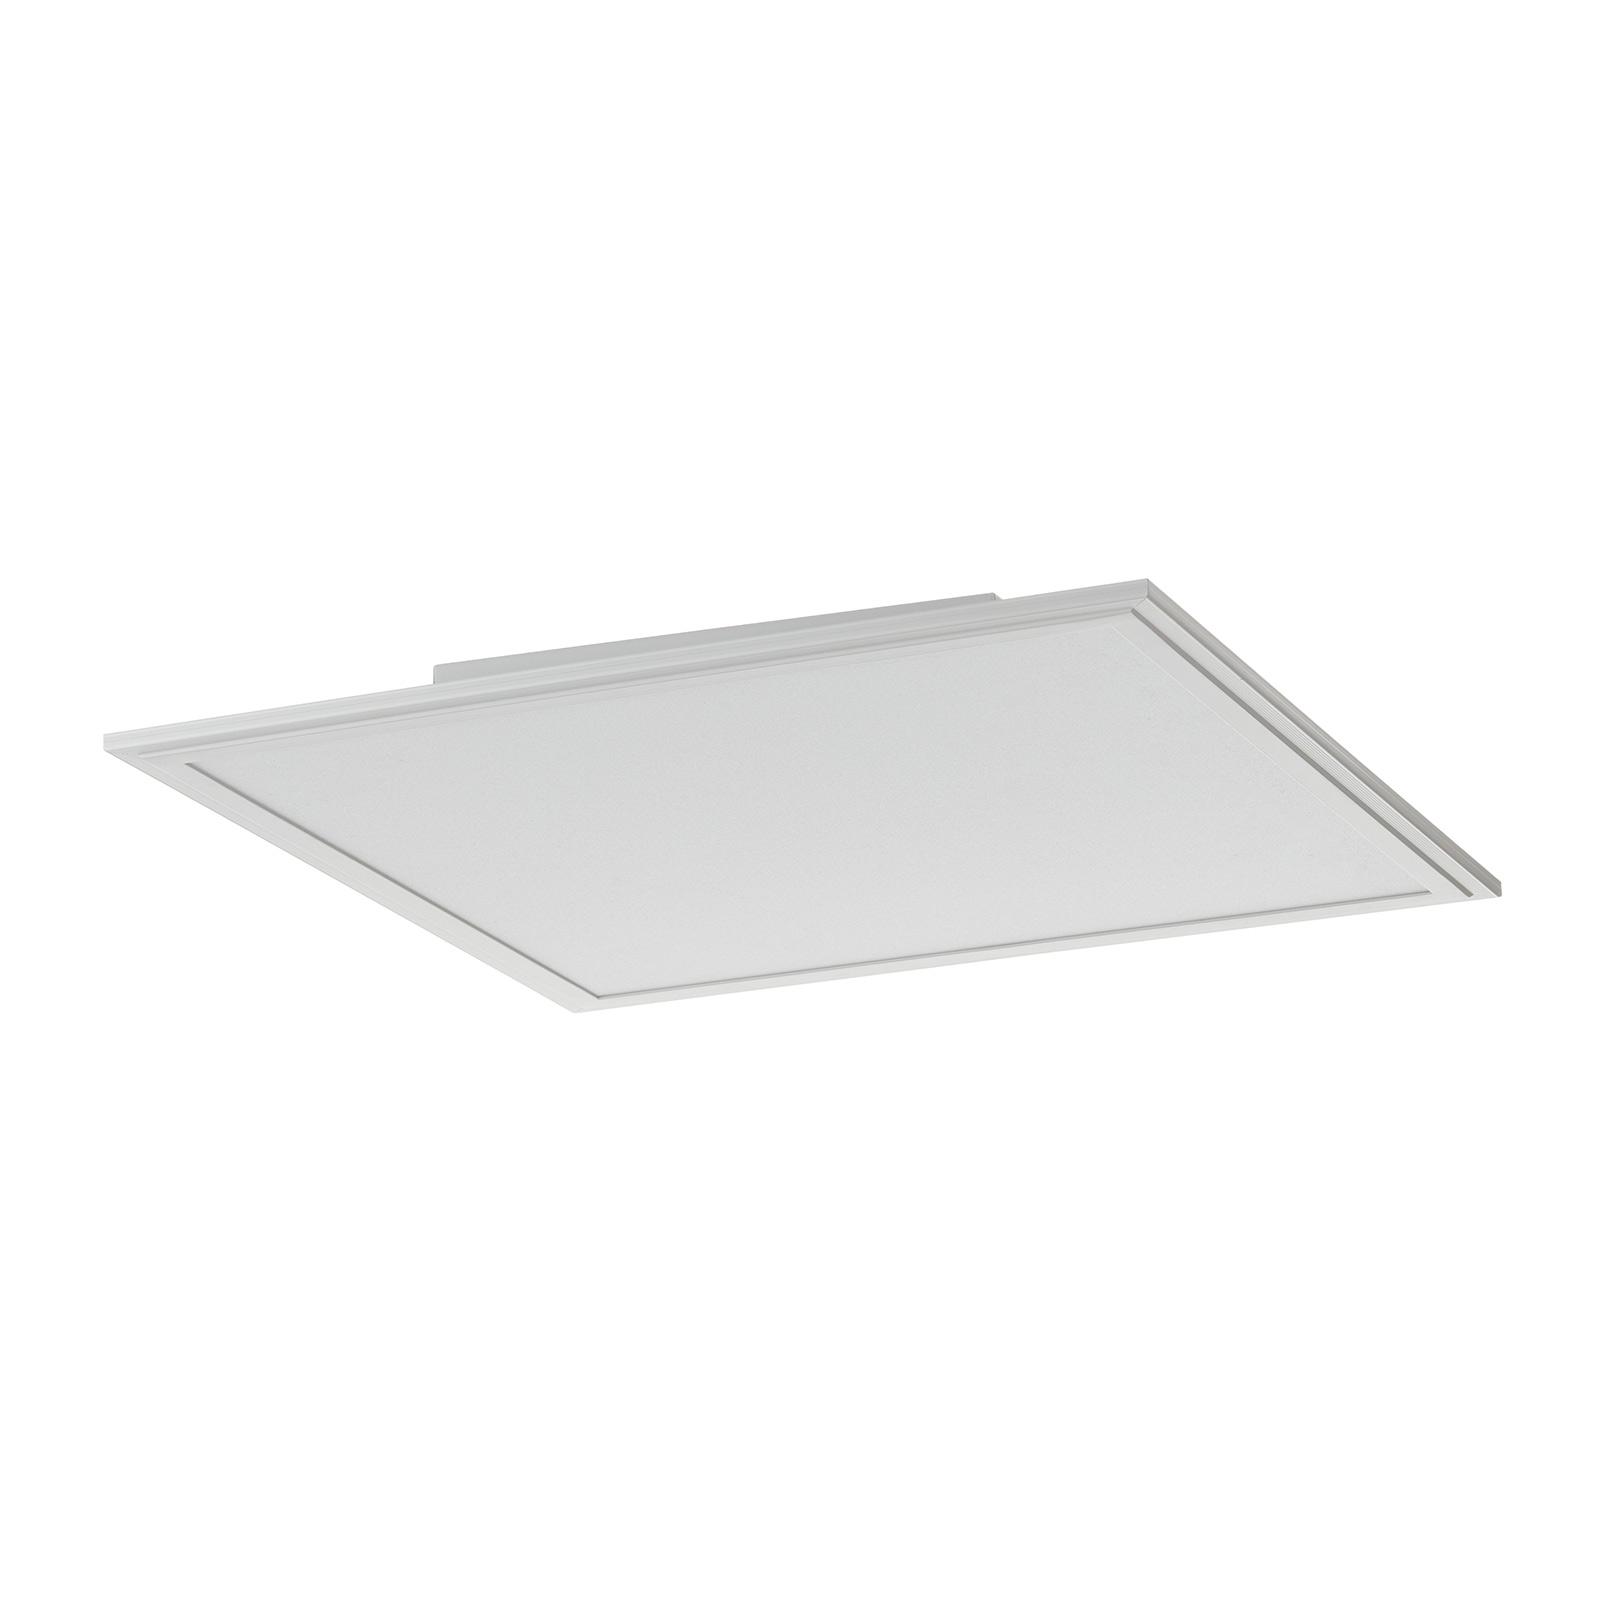 EGLO connect Salobrena-C LED-Panel, 45x45 cm weiß